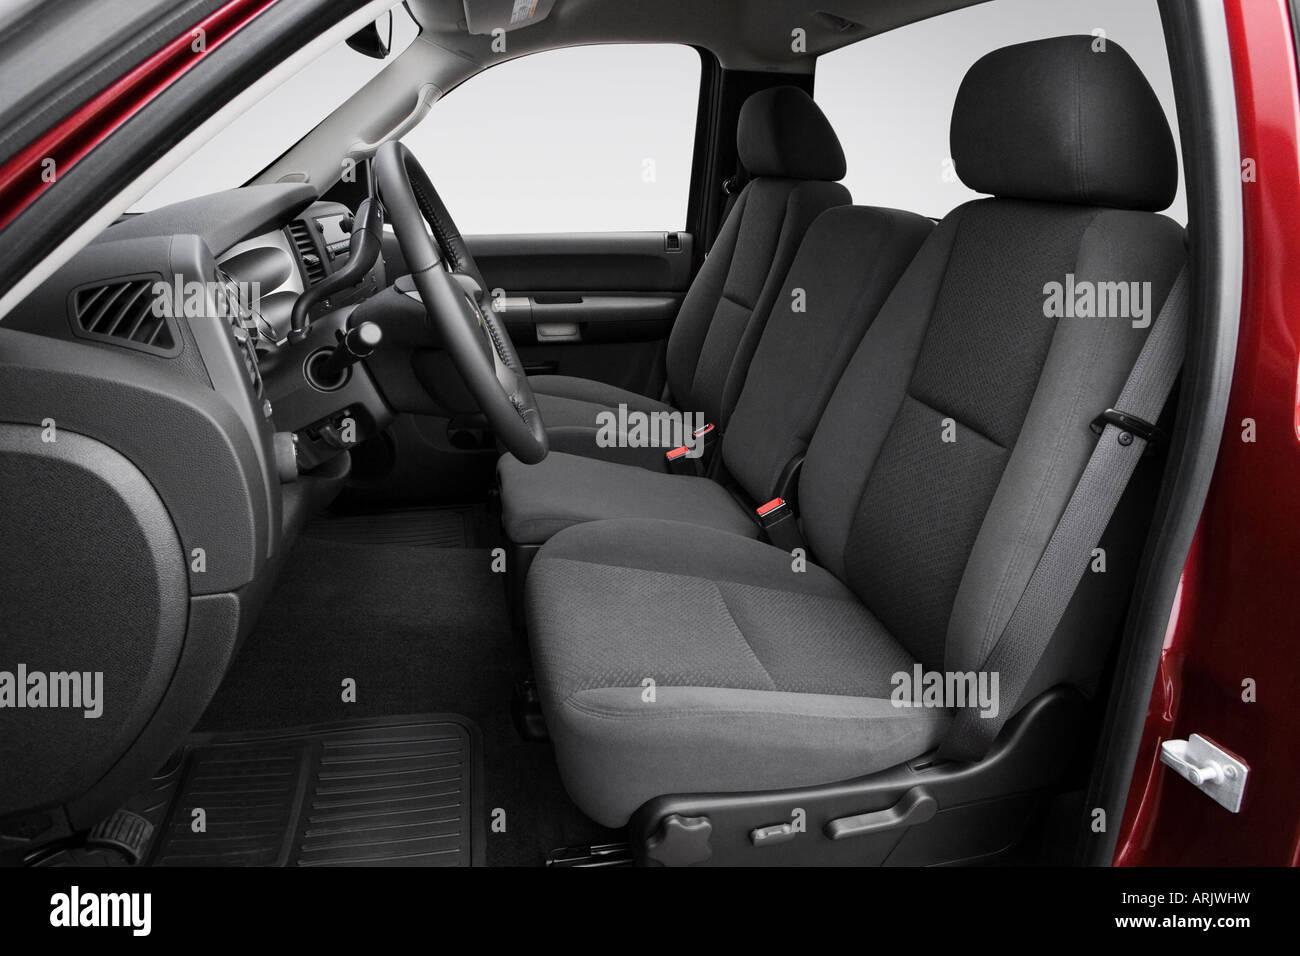 2008 chevrolet silverado 1500 lt1 in red - front seats